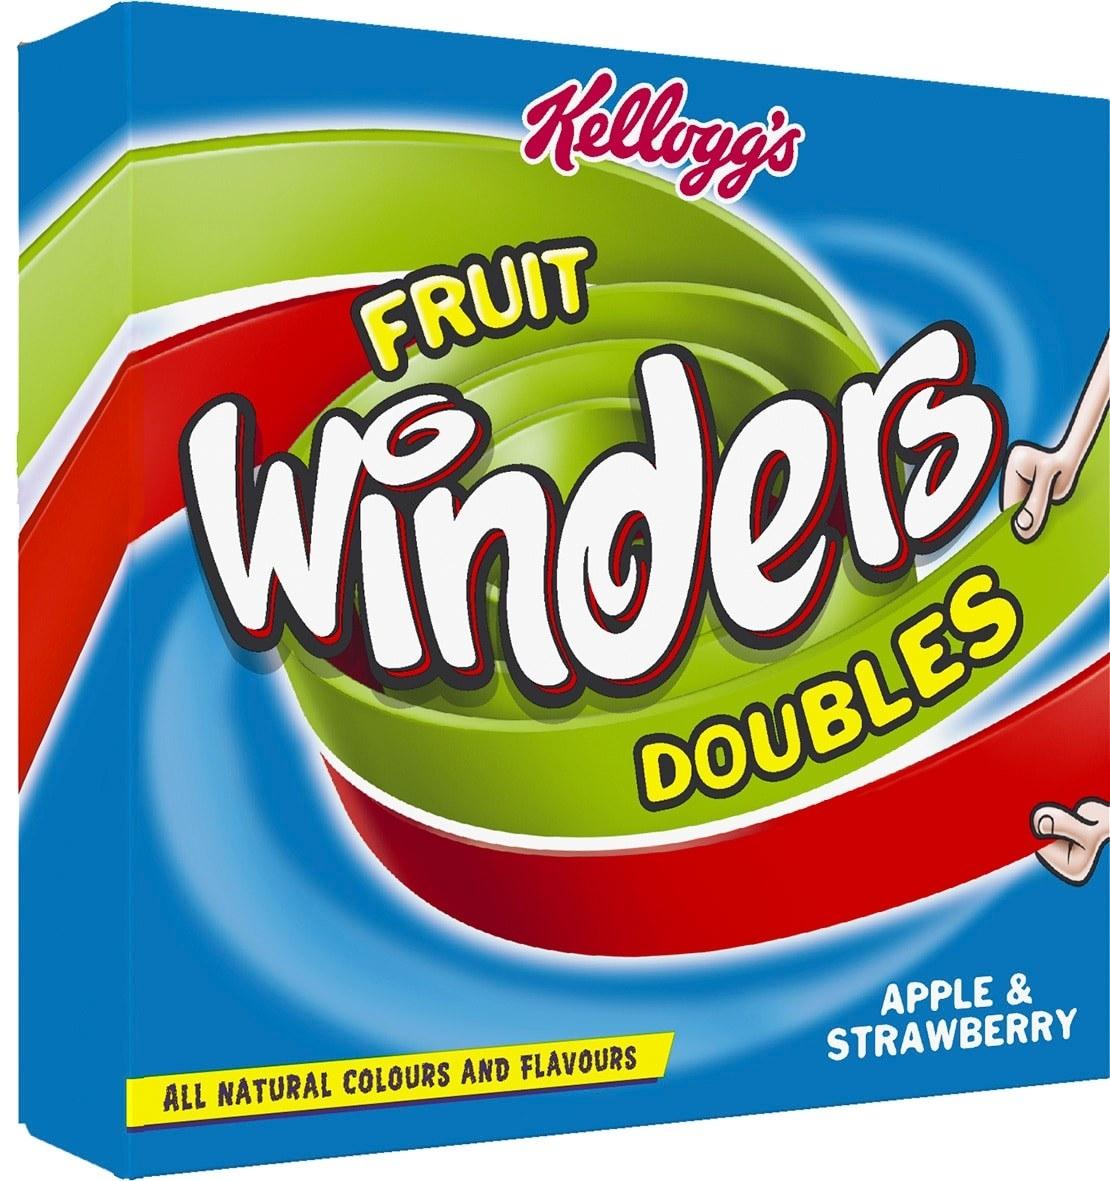 Box of Kellogg's Fruit Winders